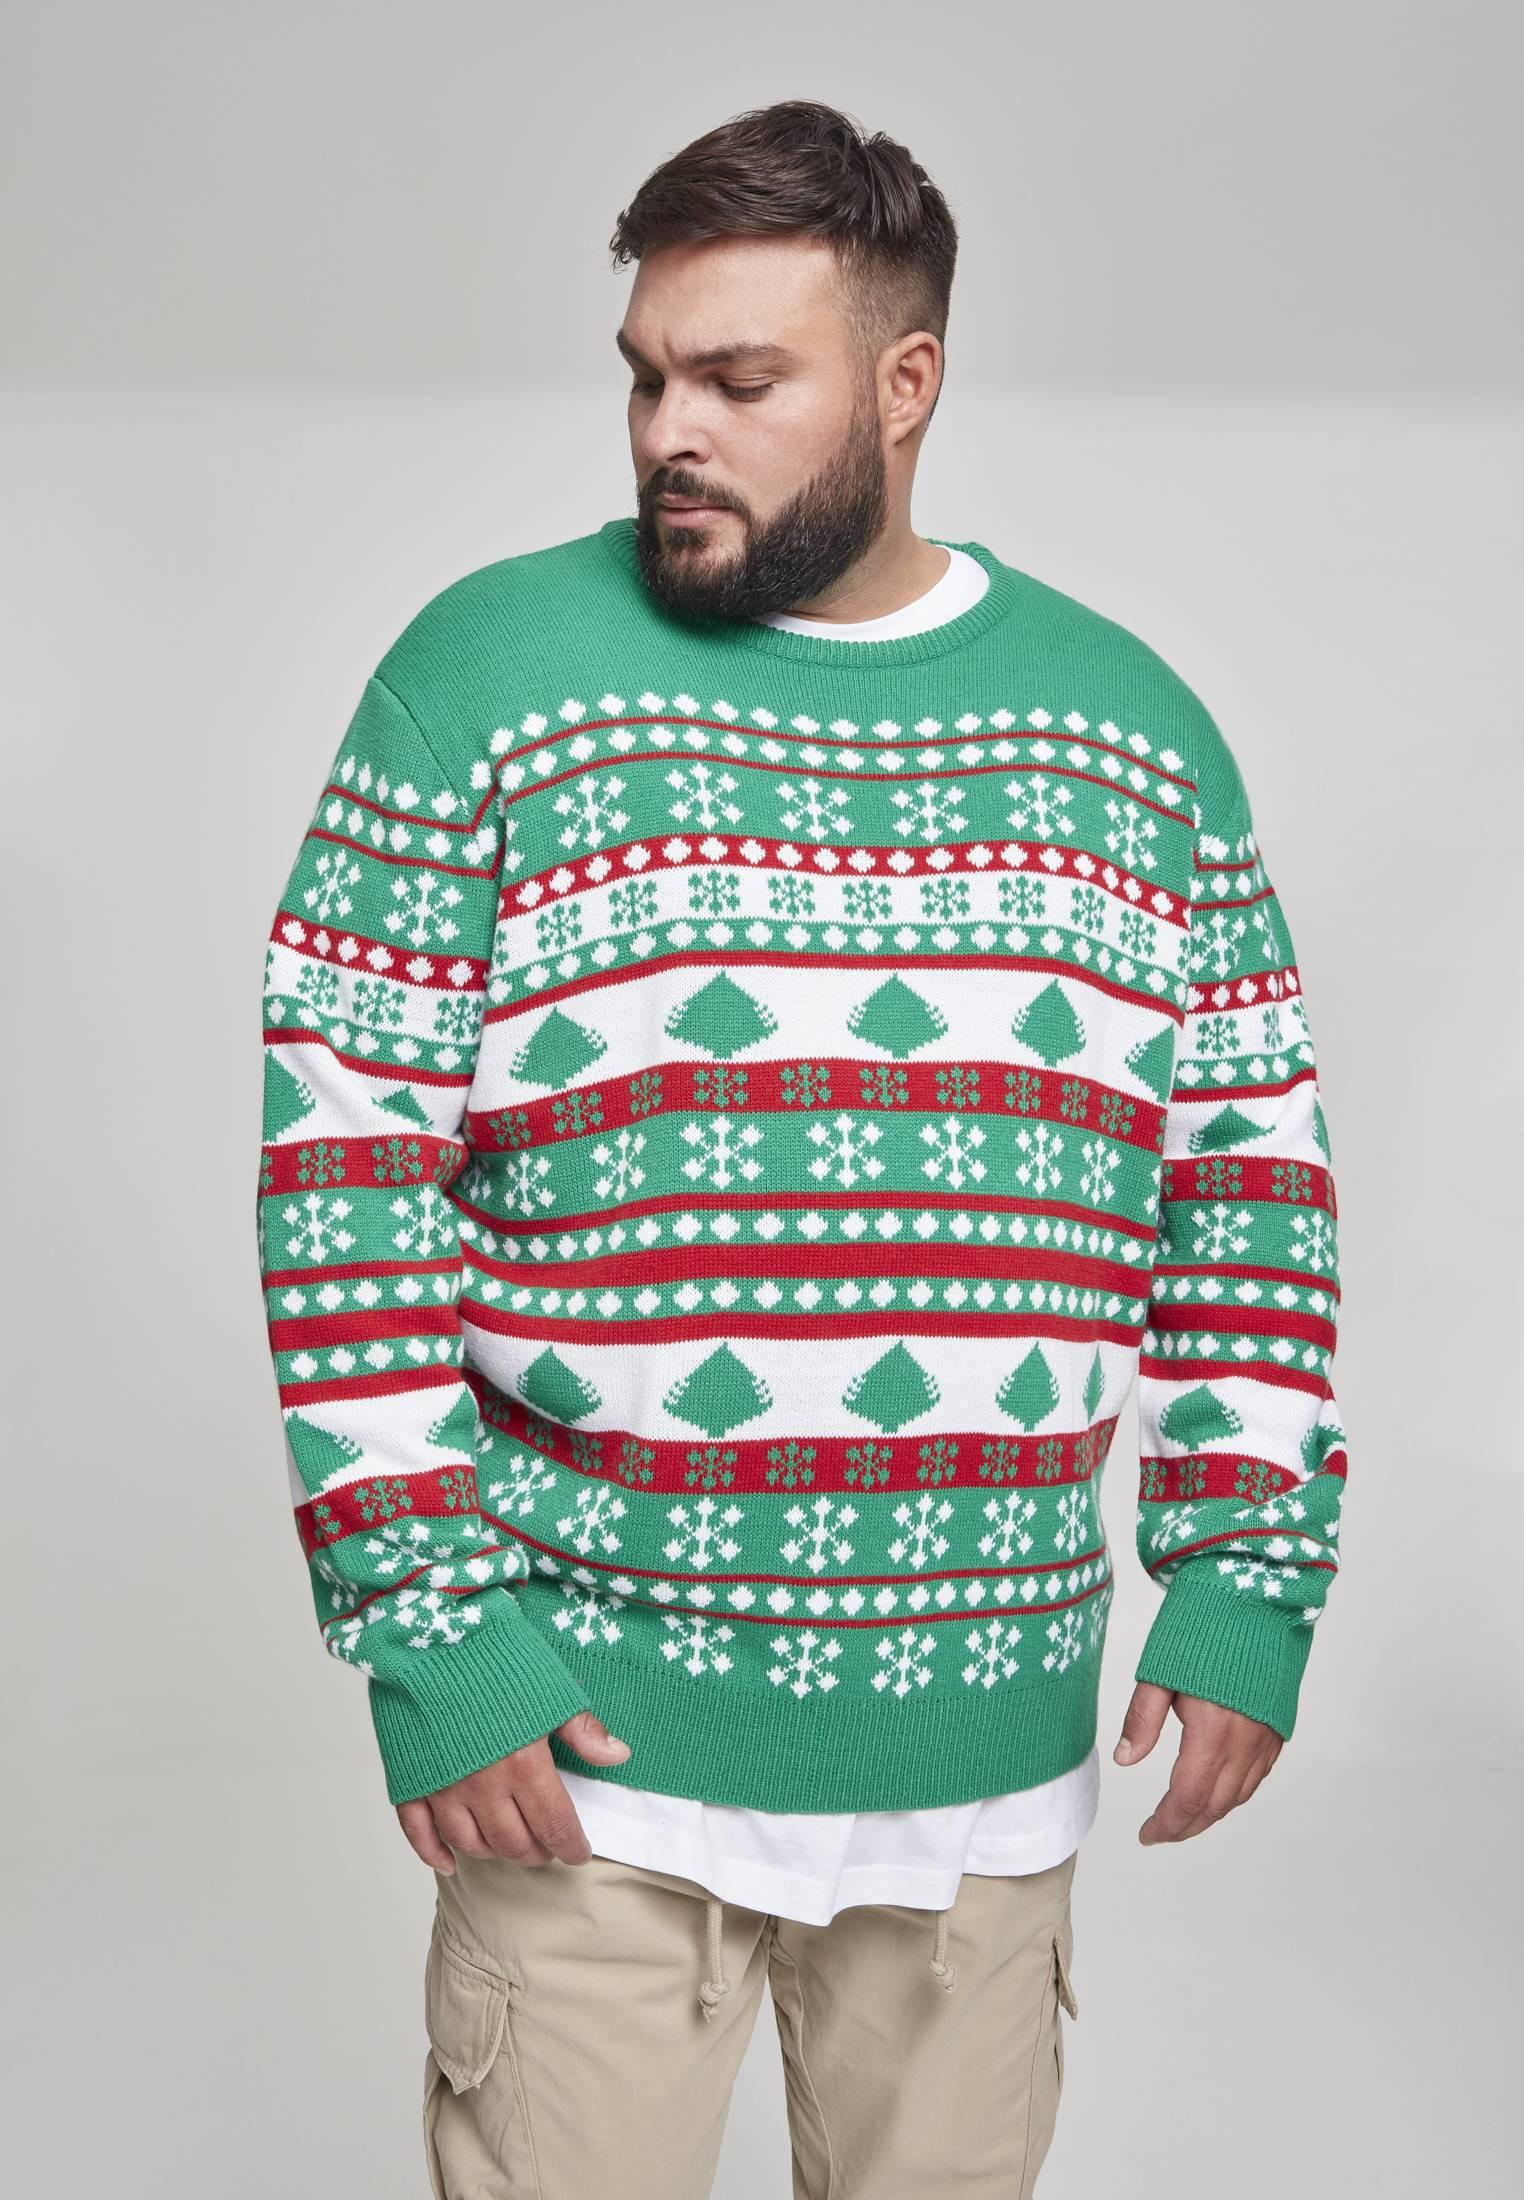 Urban Classics Snowflake Christmas Tree Sweater treegreen/white/firered - M